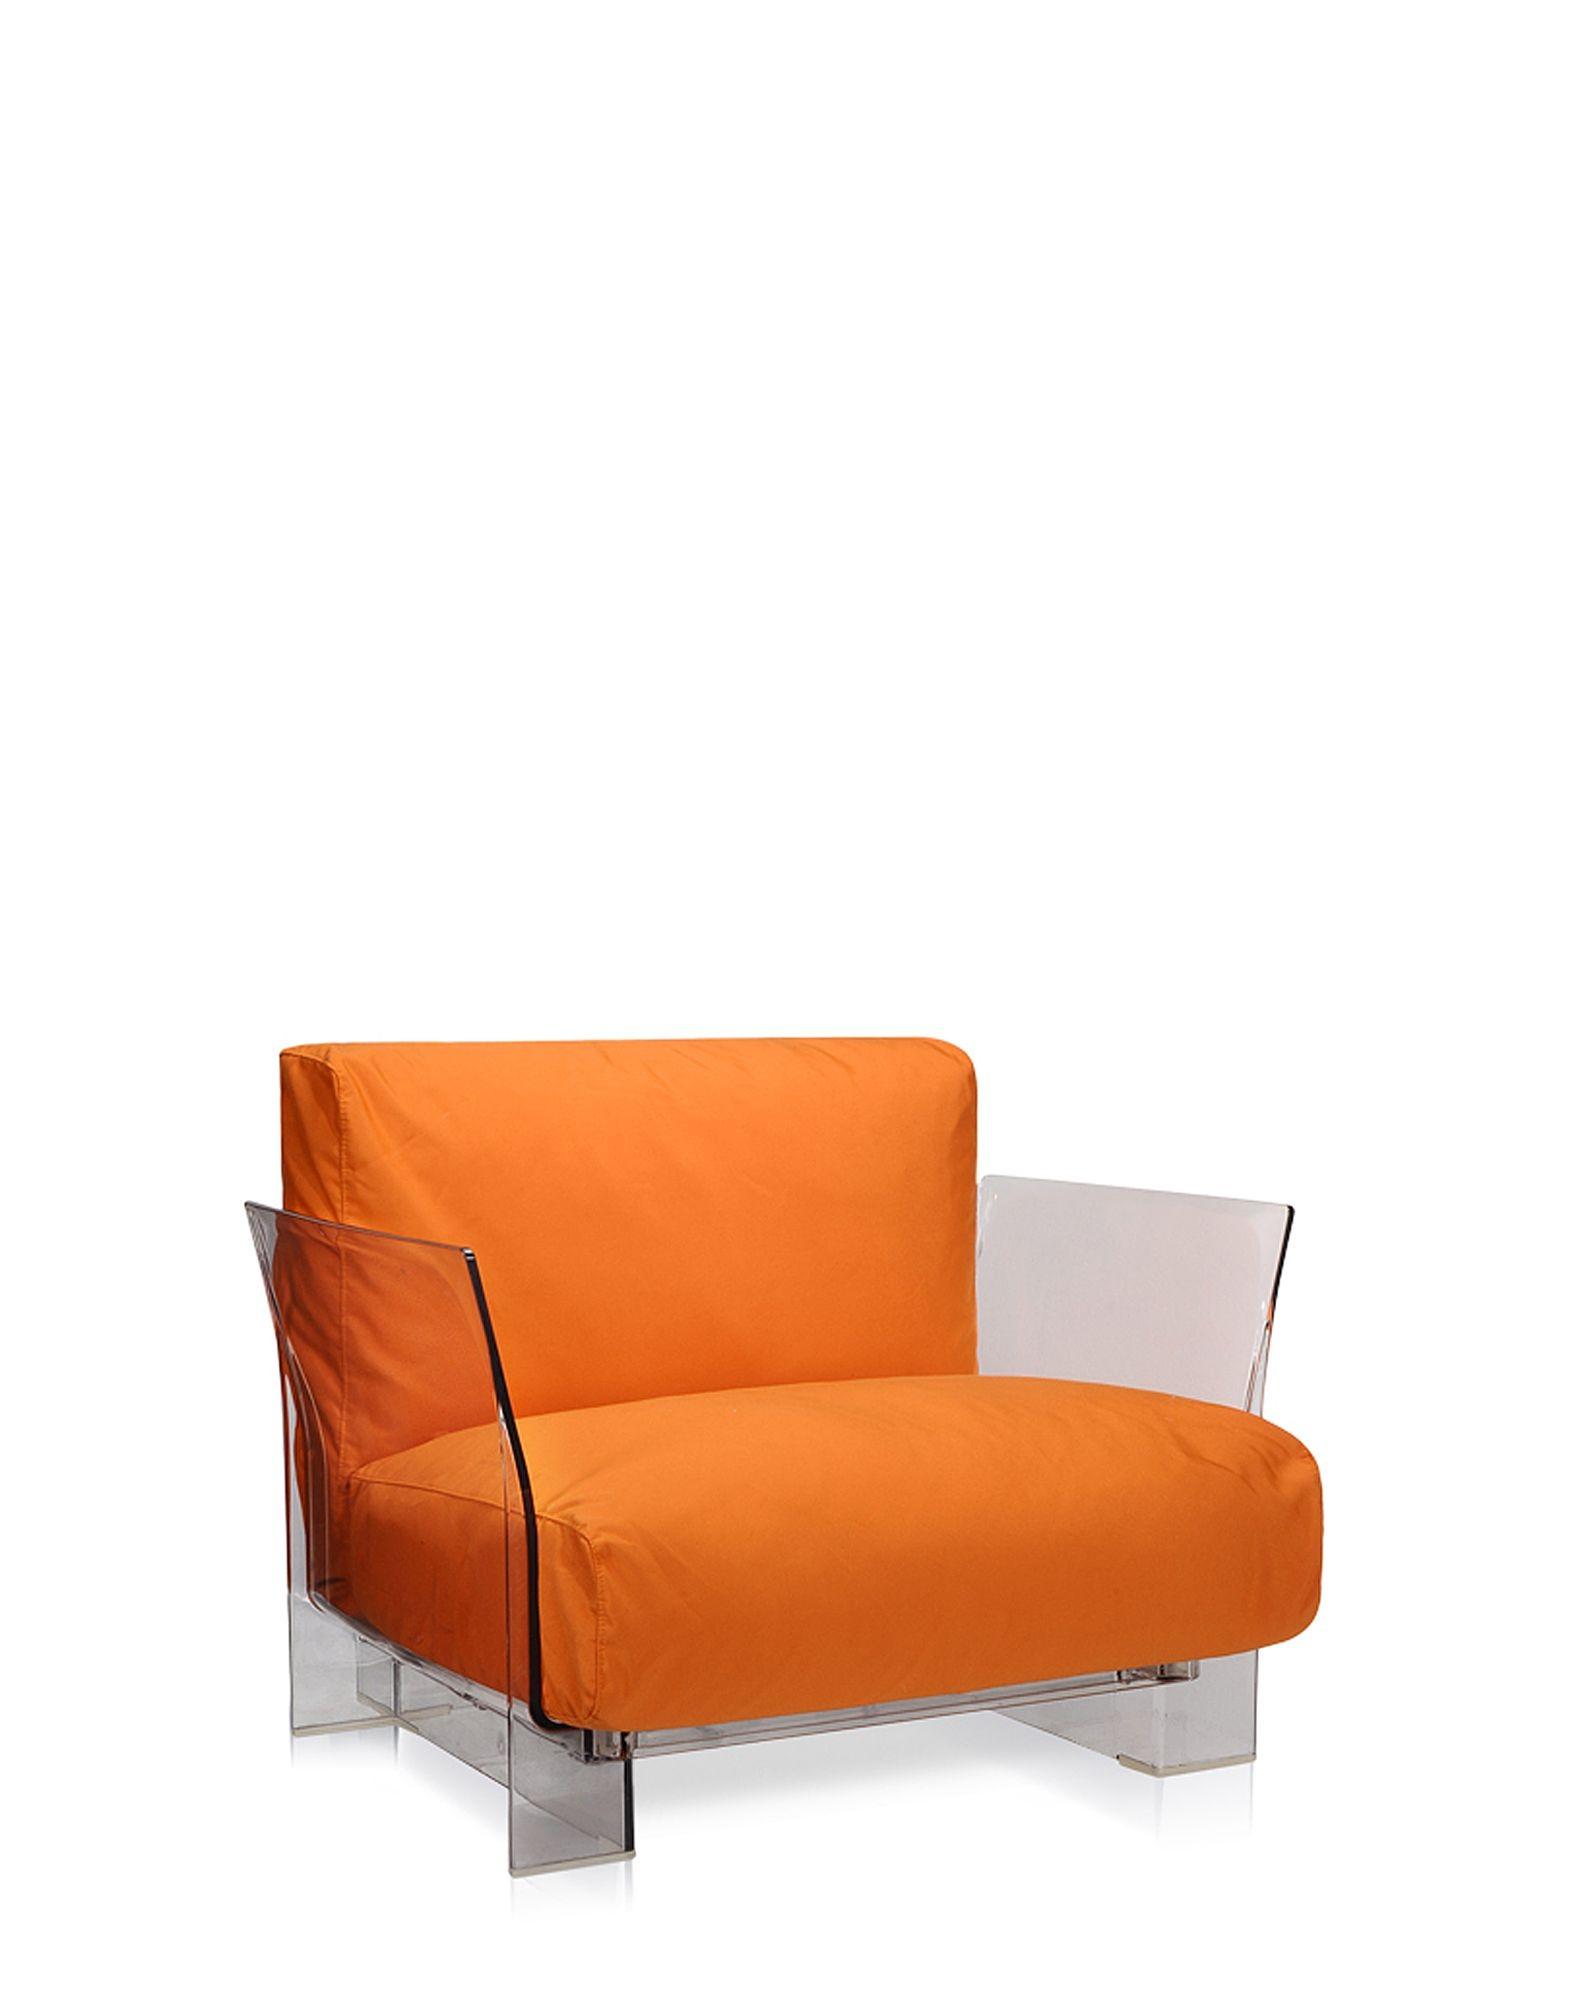 Set canapea, fotoliu, masa si lampa pentru exterior Kartell